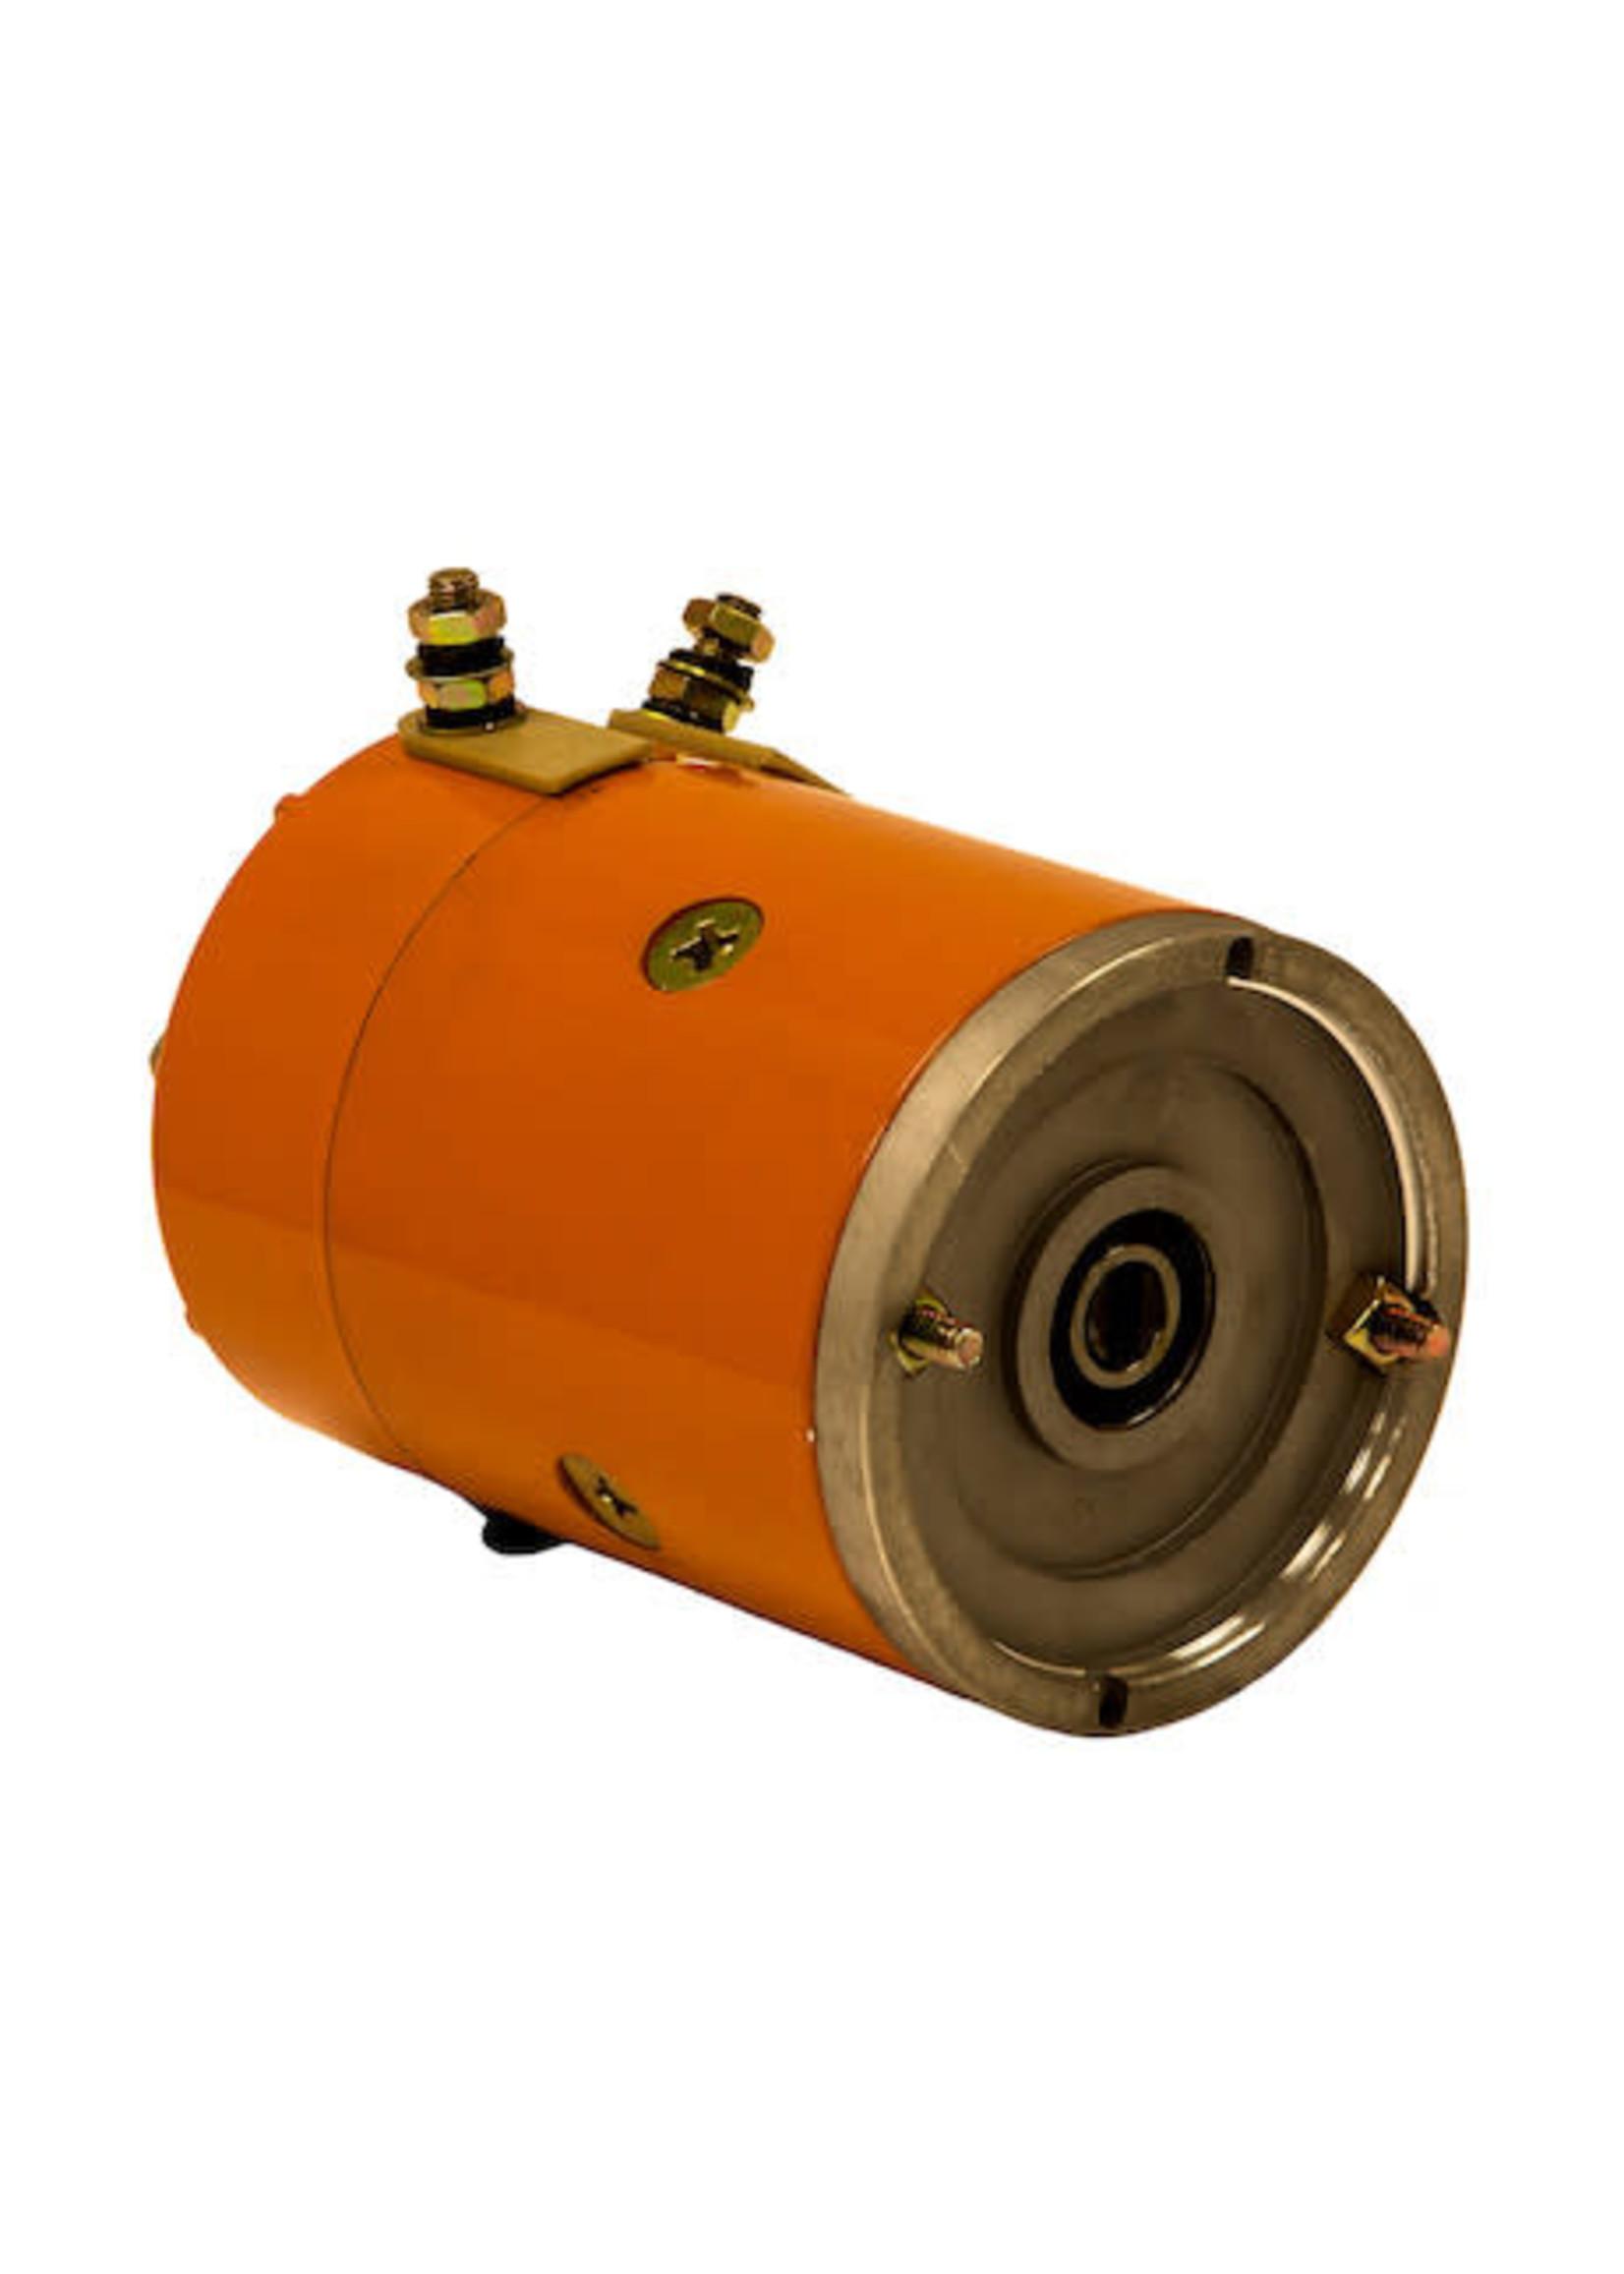 SAM SAM 4-1/2 Inch Twin Post Motor-Replaces Meyer/Diamond #15841/15727/15689